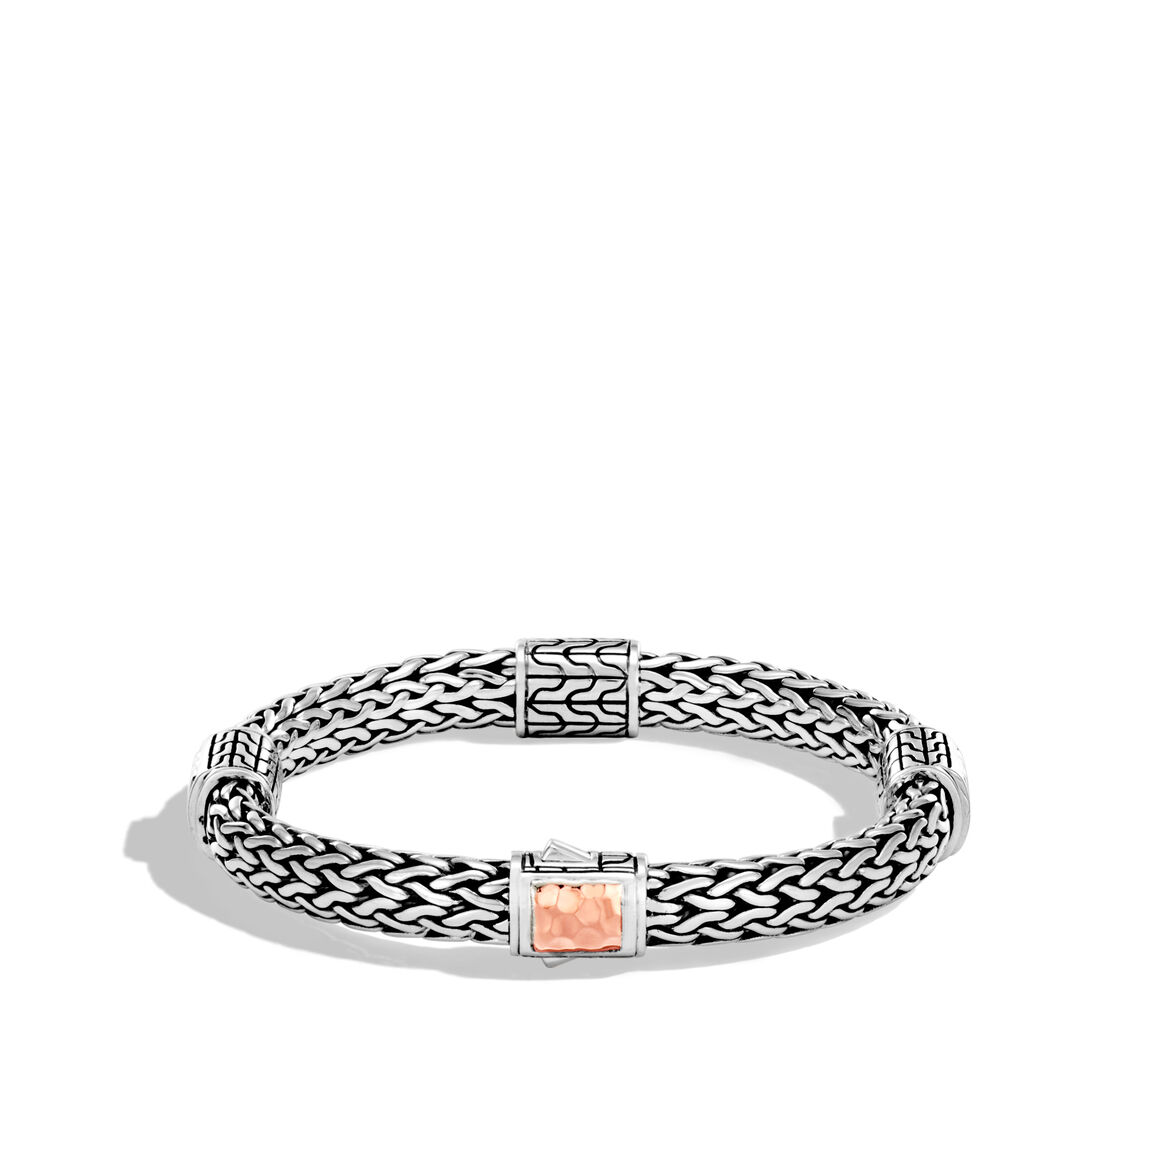 Classic Chain 7.5MM Hammered Station Bracelet, Silver, 18K Rose